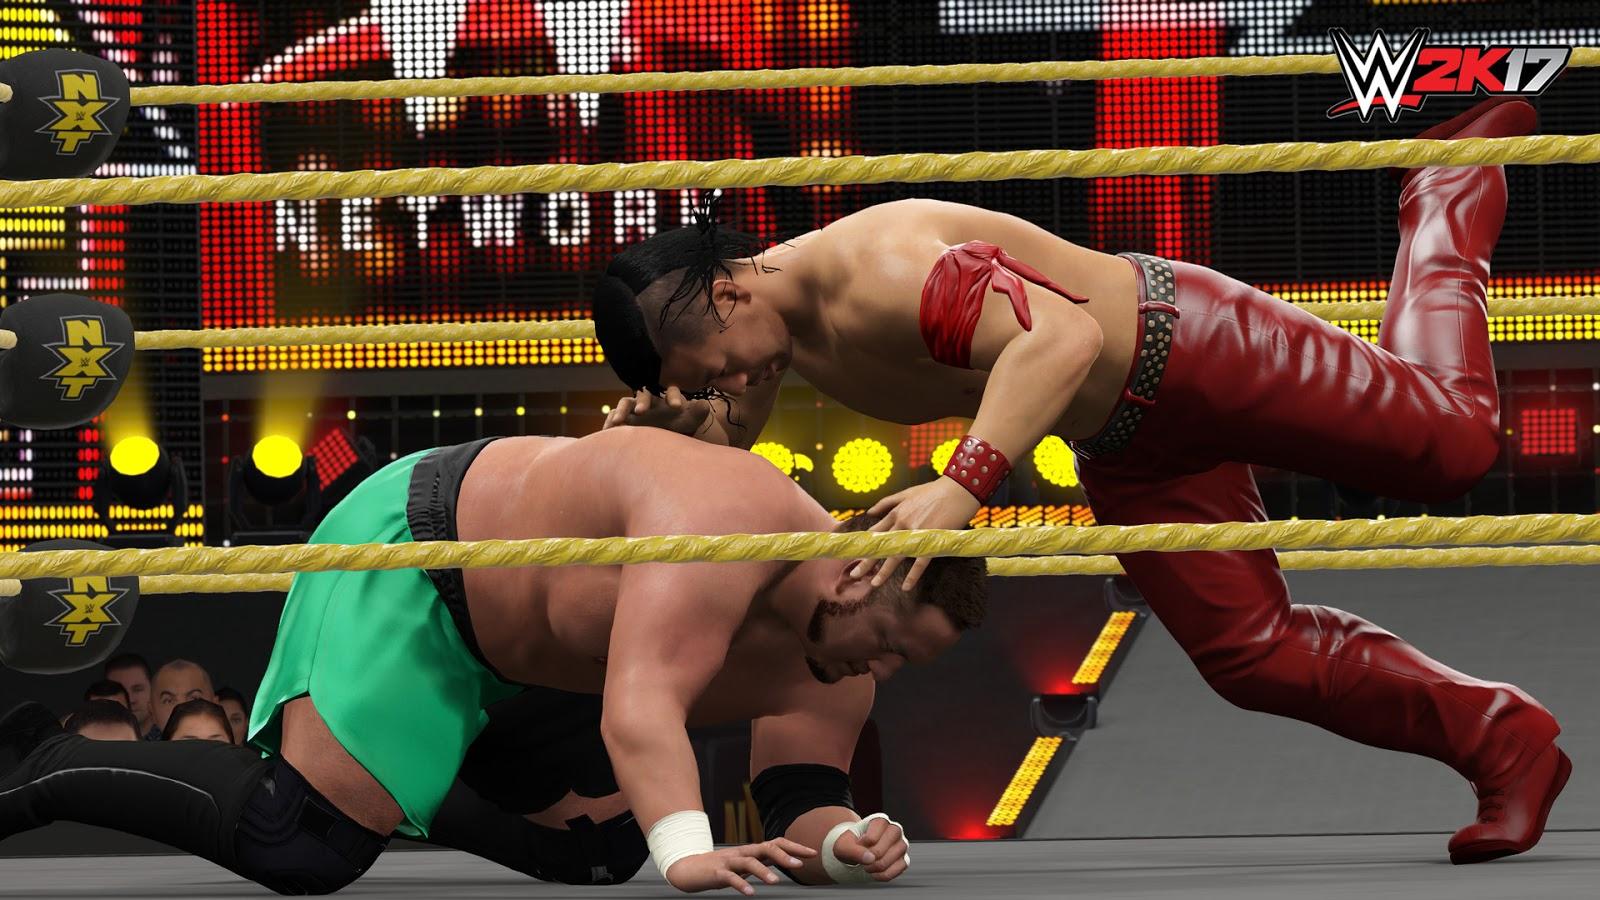 WWE 2K17 ESPAÑOL PC Descargar Full (CODEX) + REPACK 10 DVD5 (JPW) 5